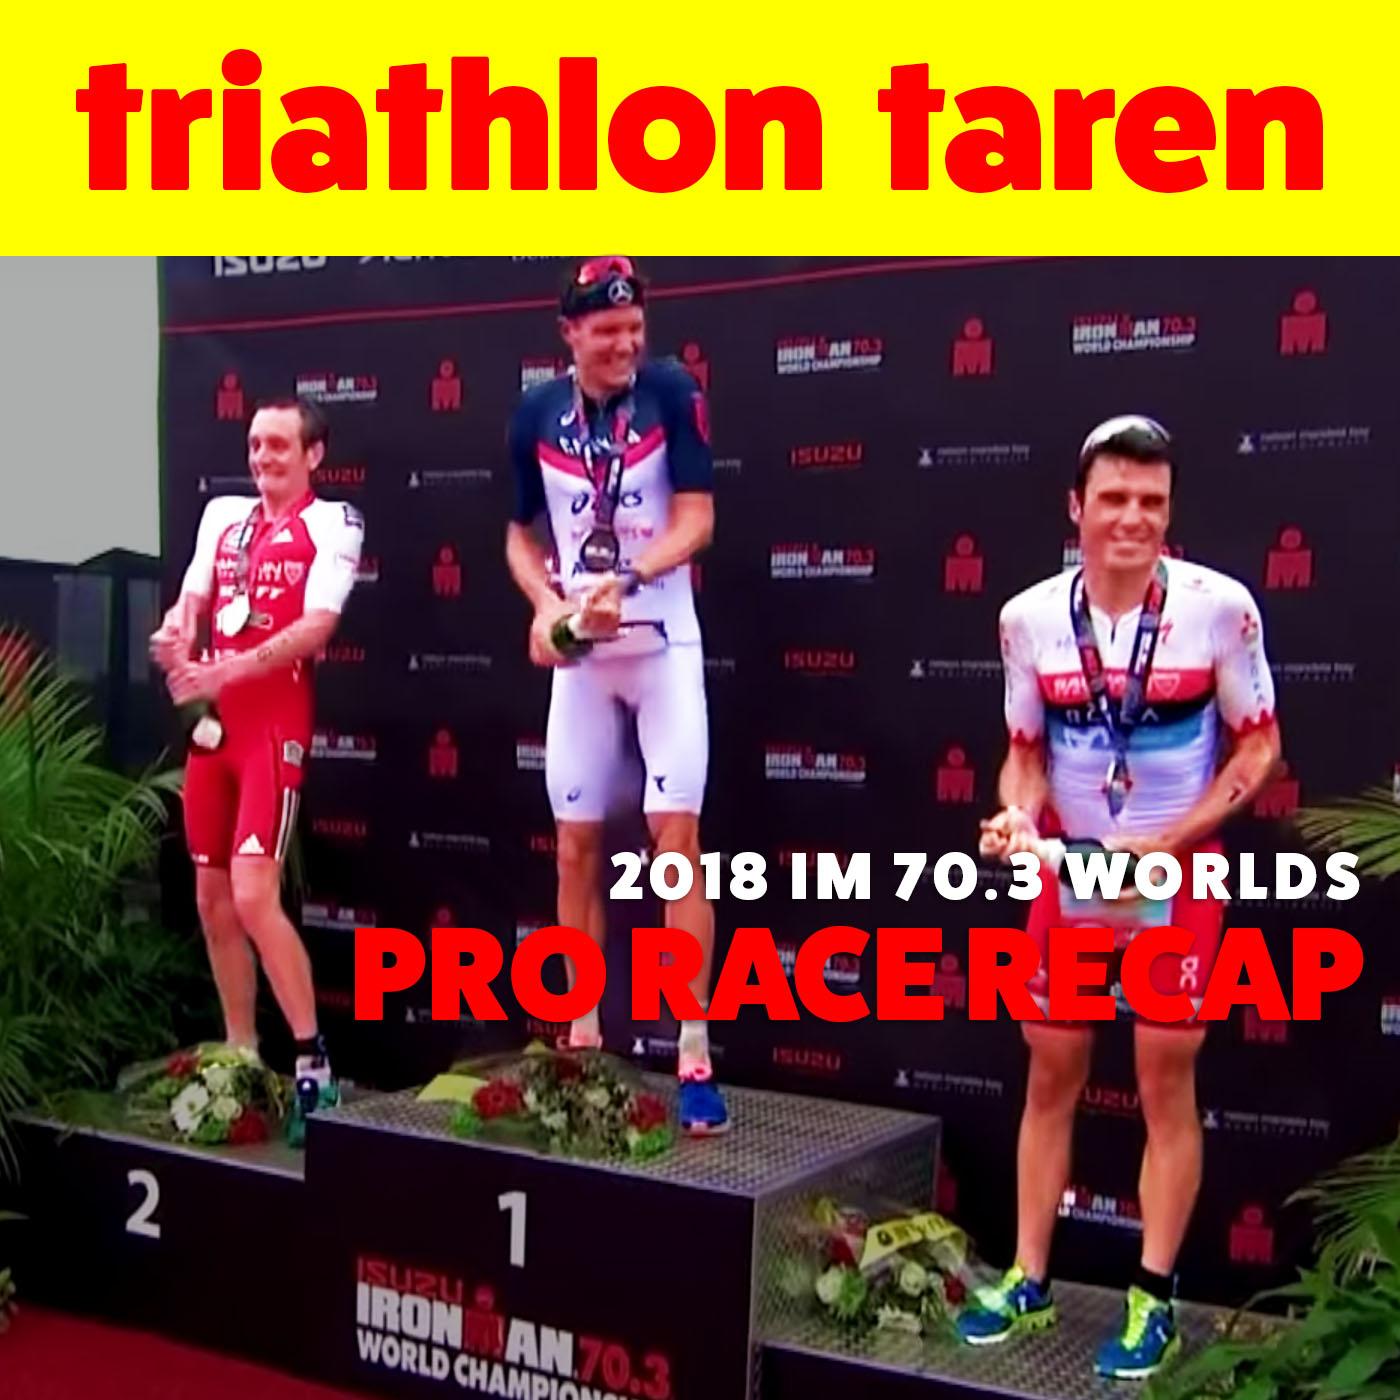 2018 Ironman 70.3 World Championship Pro Race Recap